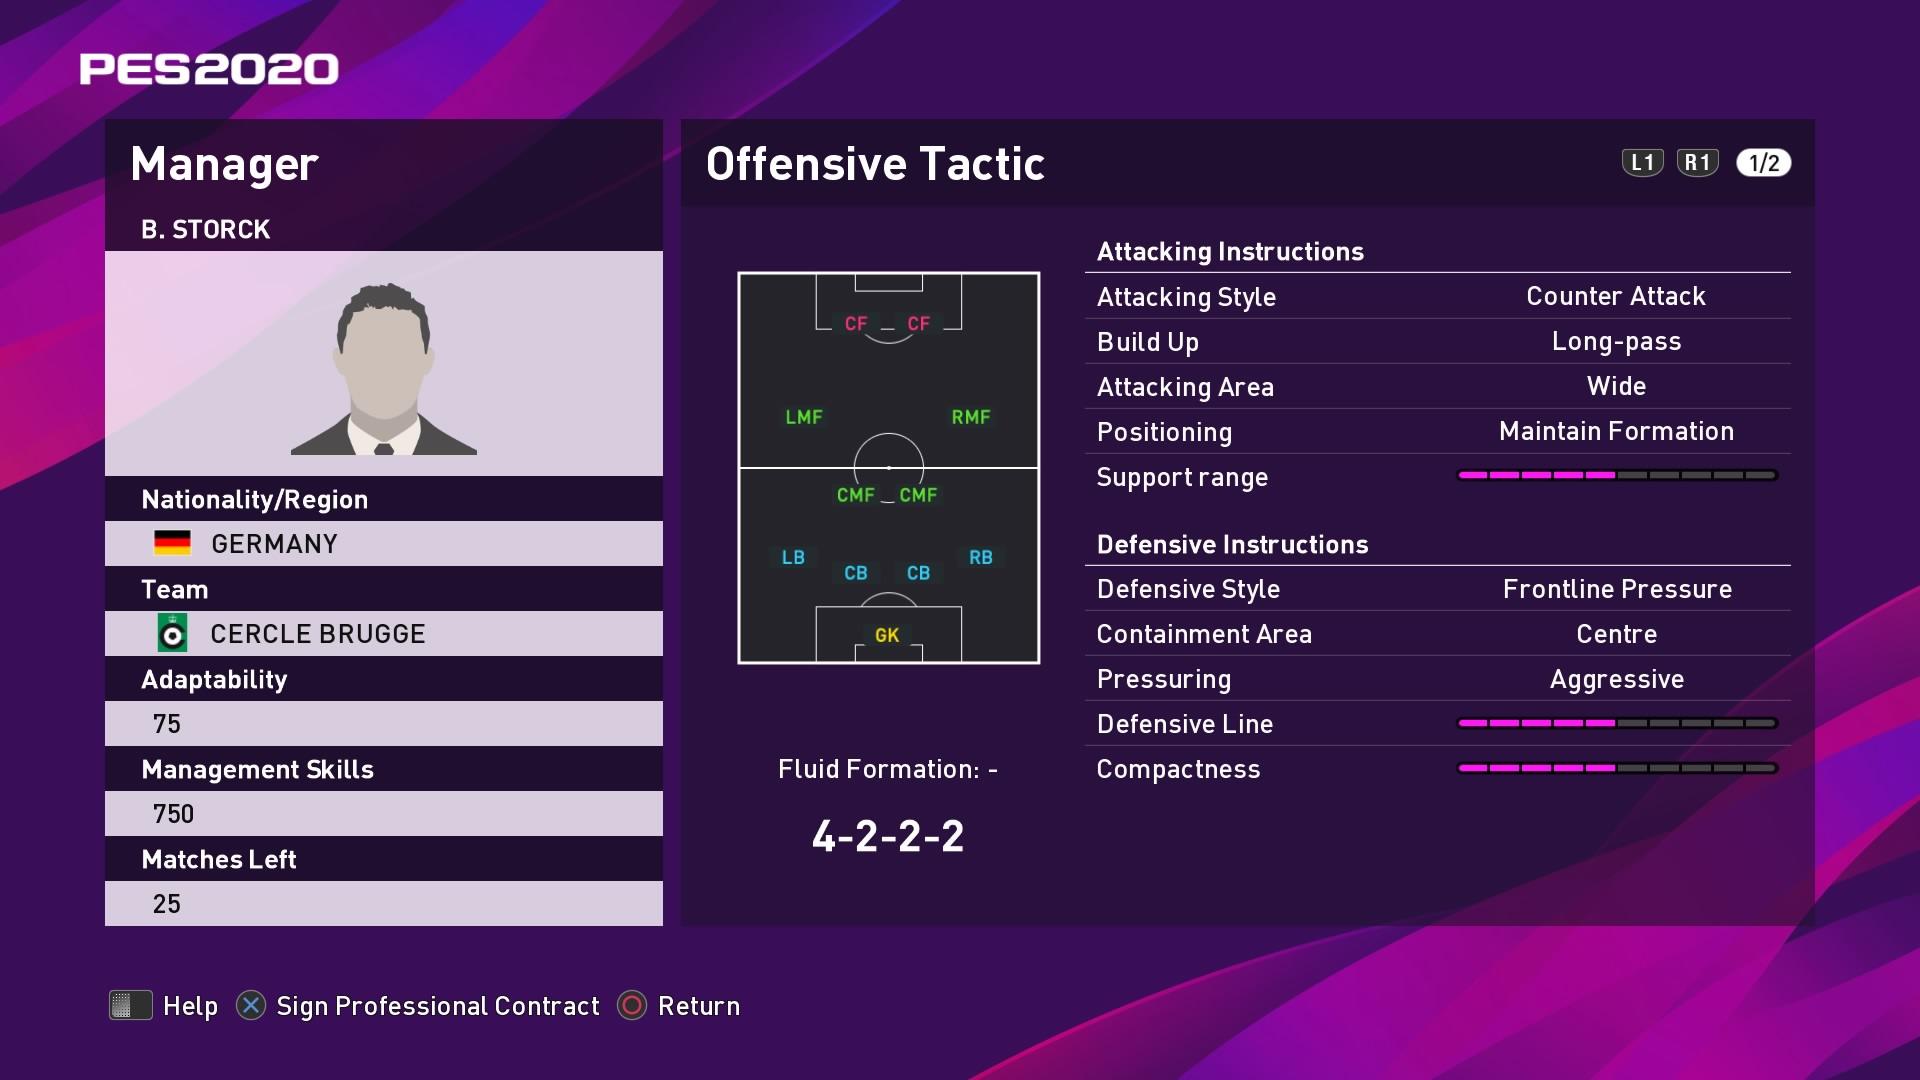 B. Storck (Bernd Storck) Offensive Tactic in PES 2020 myClub